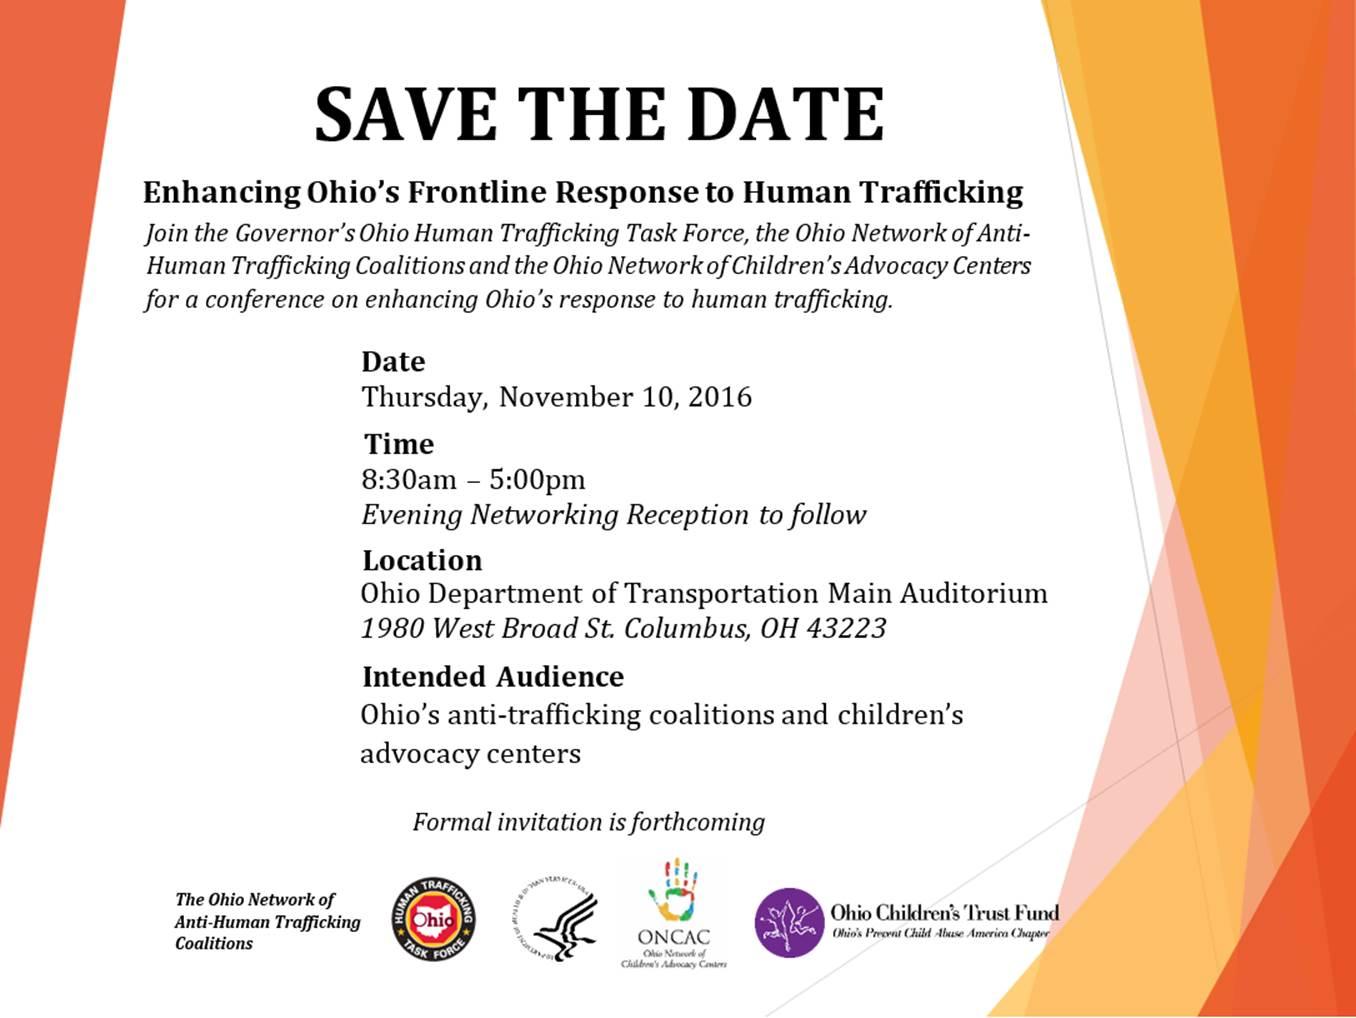 Enhancing Ohio's Frontline Response to Human Trafficking